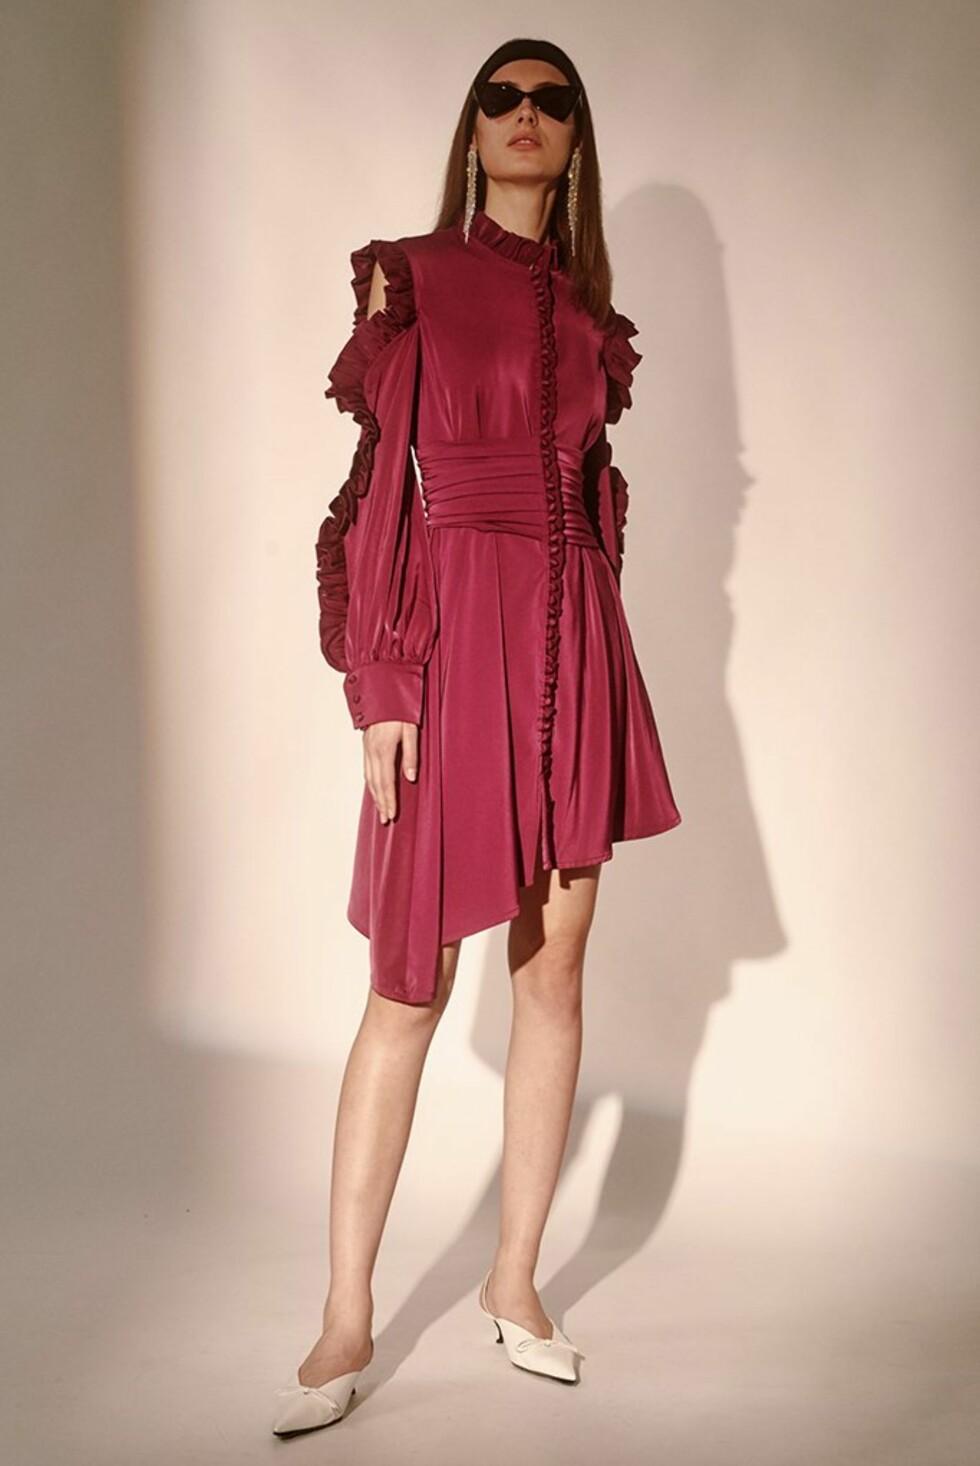 Kjole fra Style Mafia |1427,-| https://stylemafia.us/collections/new-arrivals/products/rayne-dress-purple-ruffled-sleeves#.WzNn3VUzbRZ